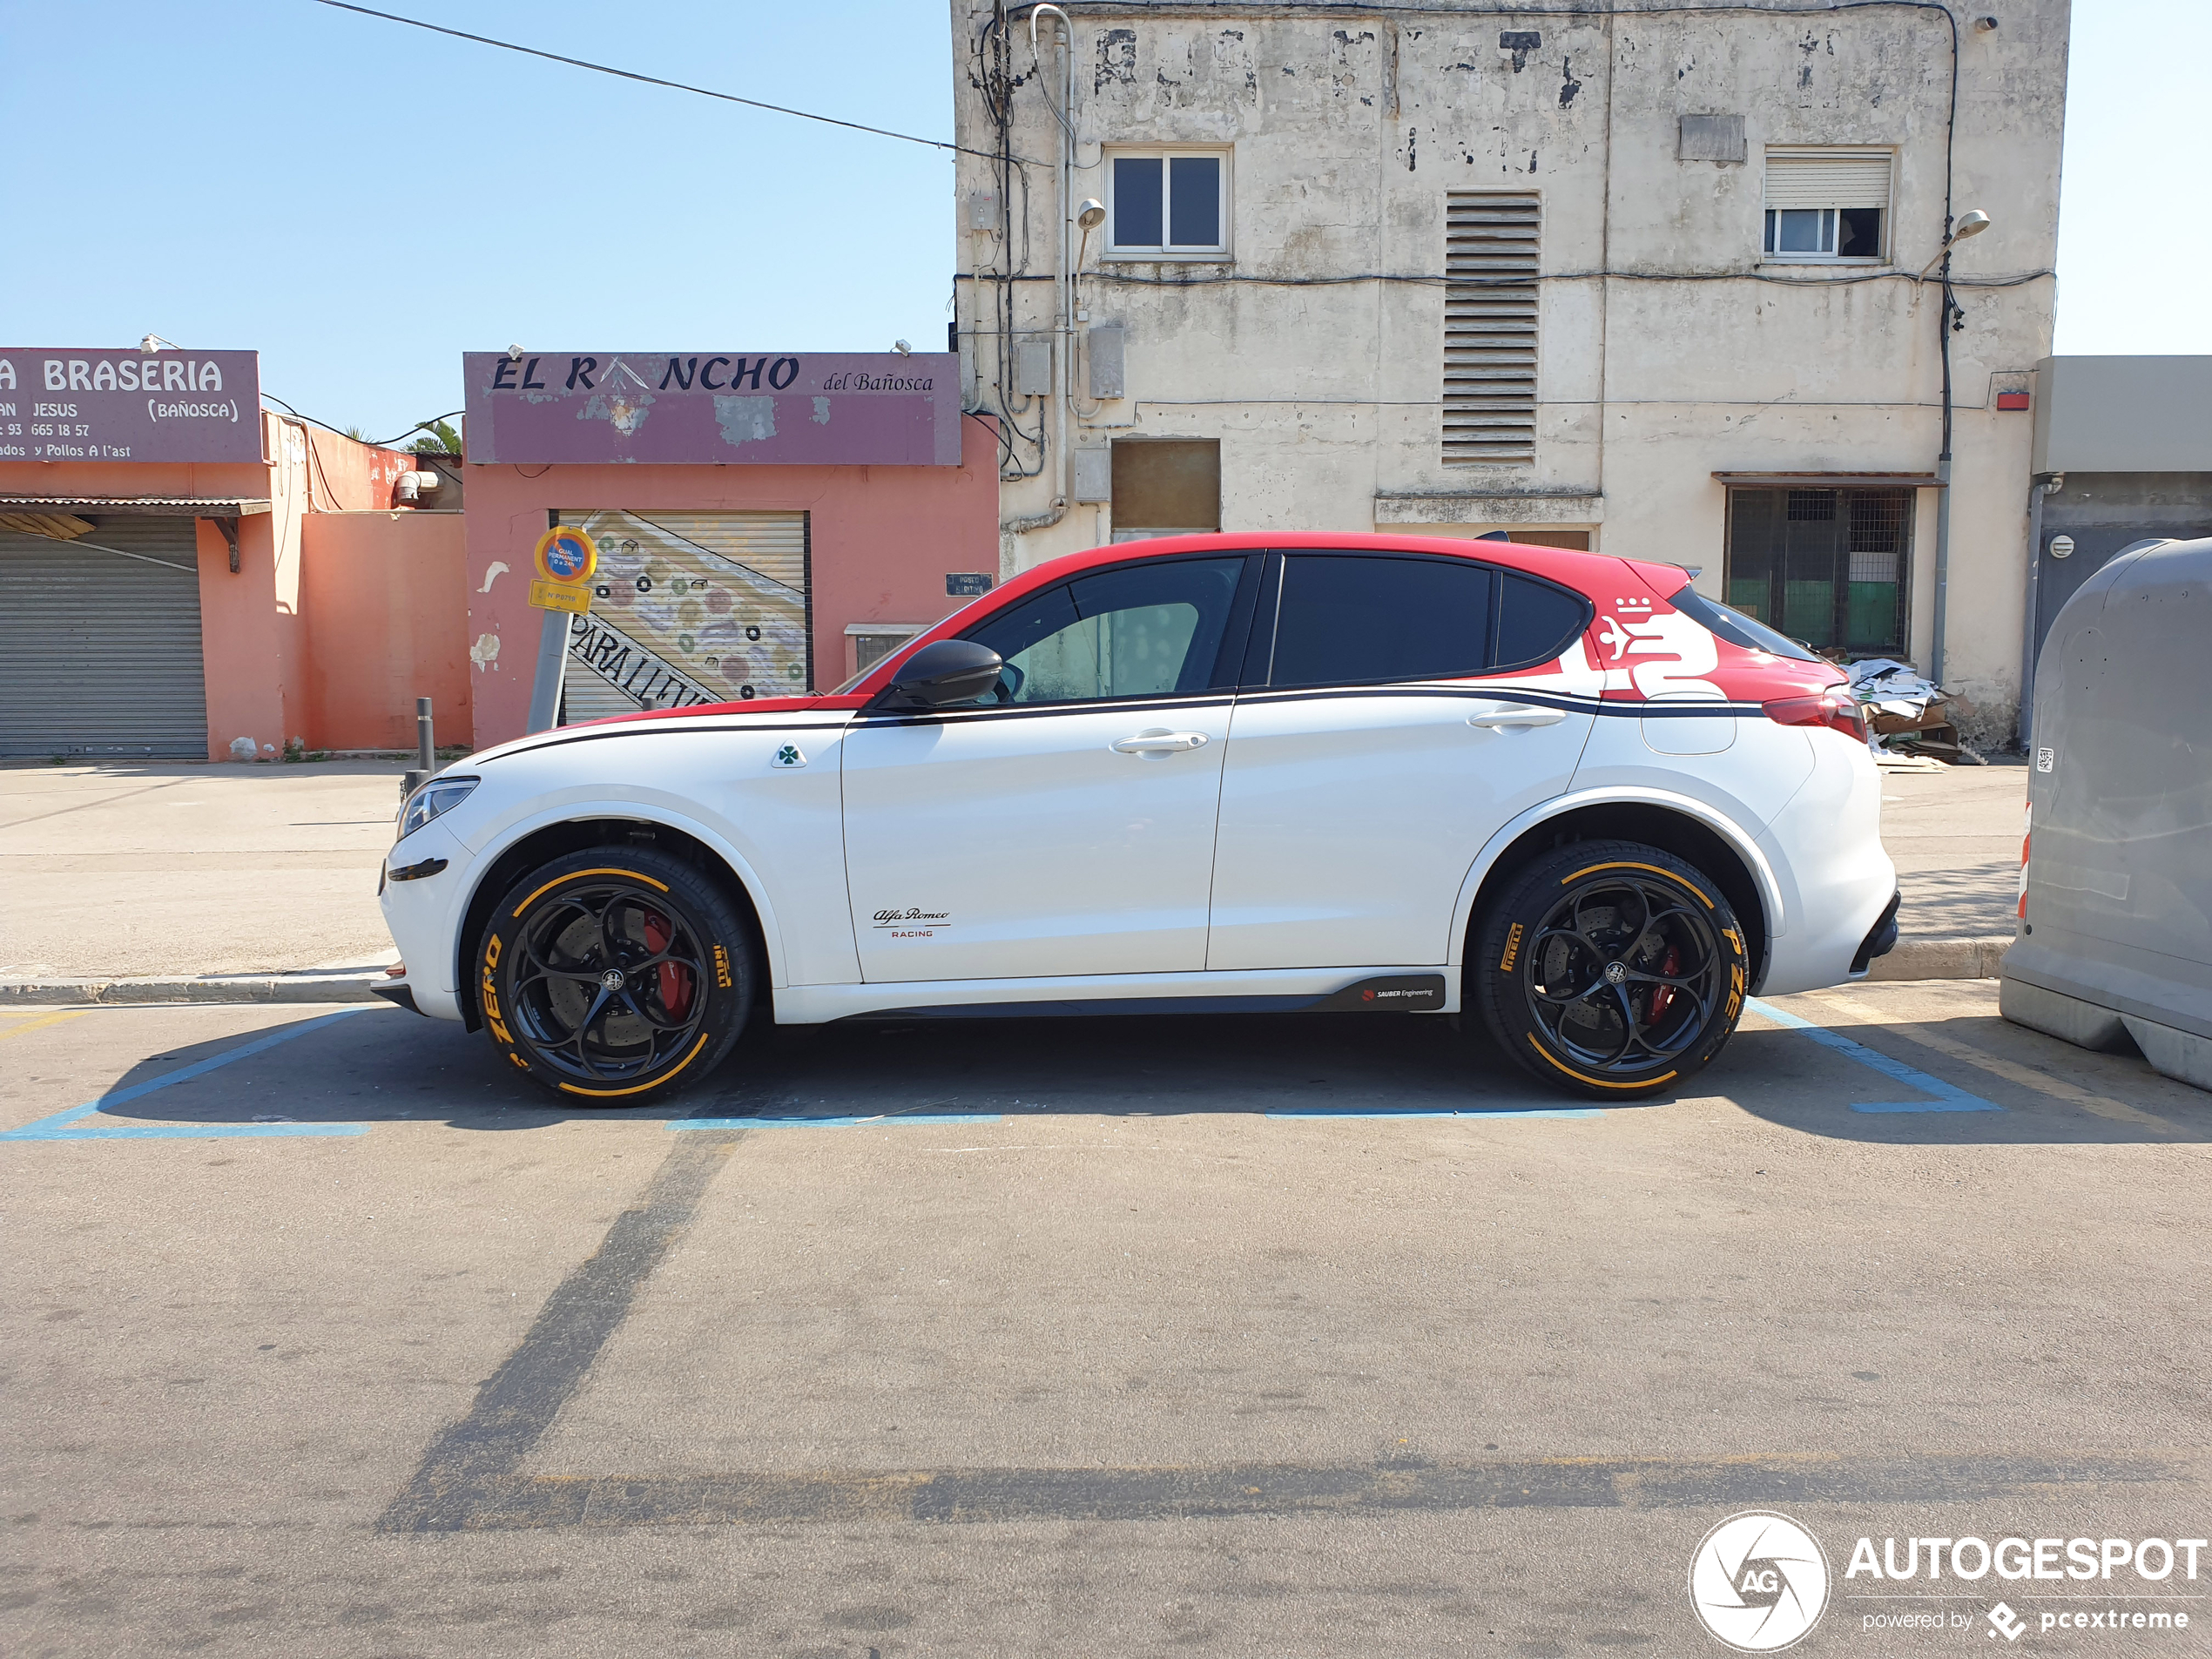 Alfa Romeo Stelvio Quadrifoglio Alfa Romeo Racing Limited Edition